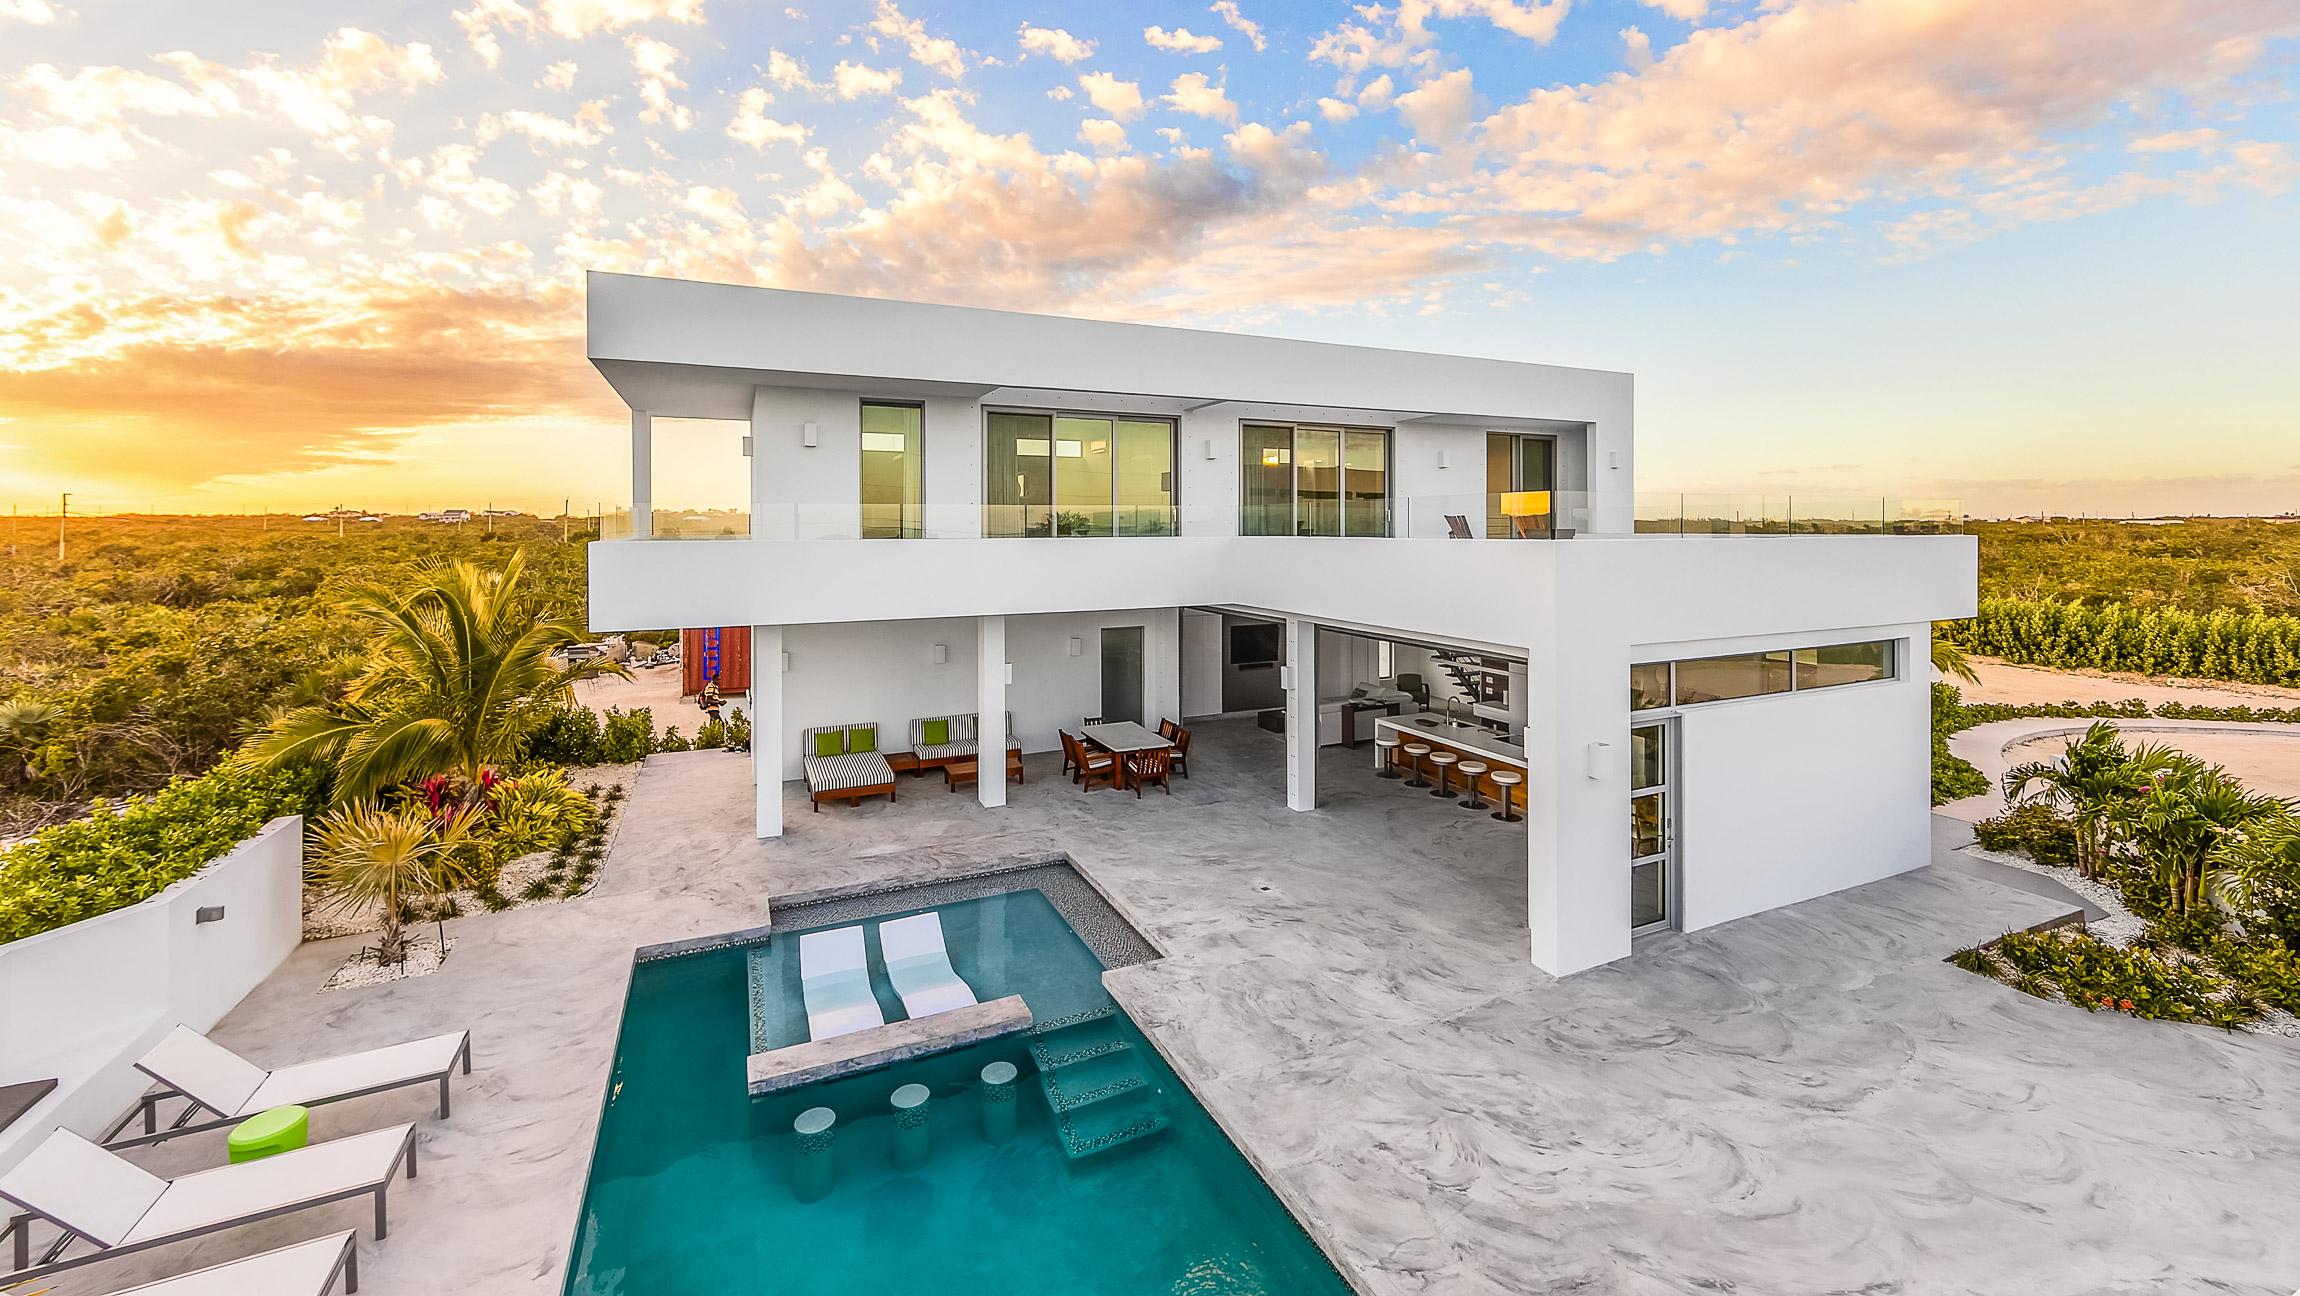 White Villas in Turks and Caicos